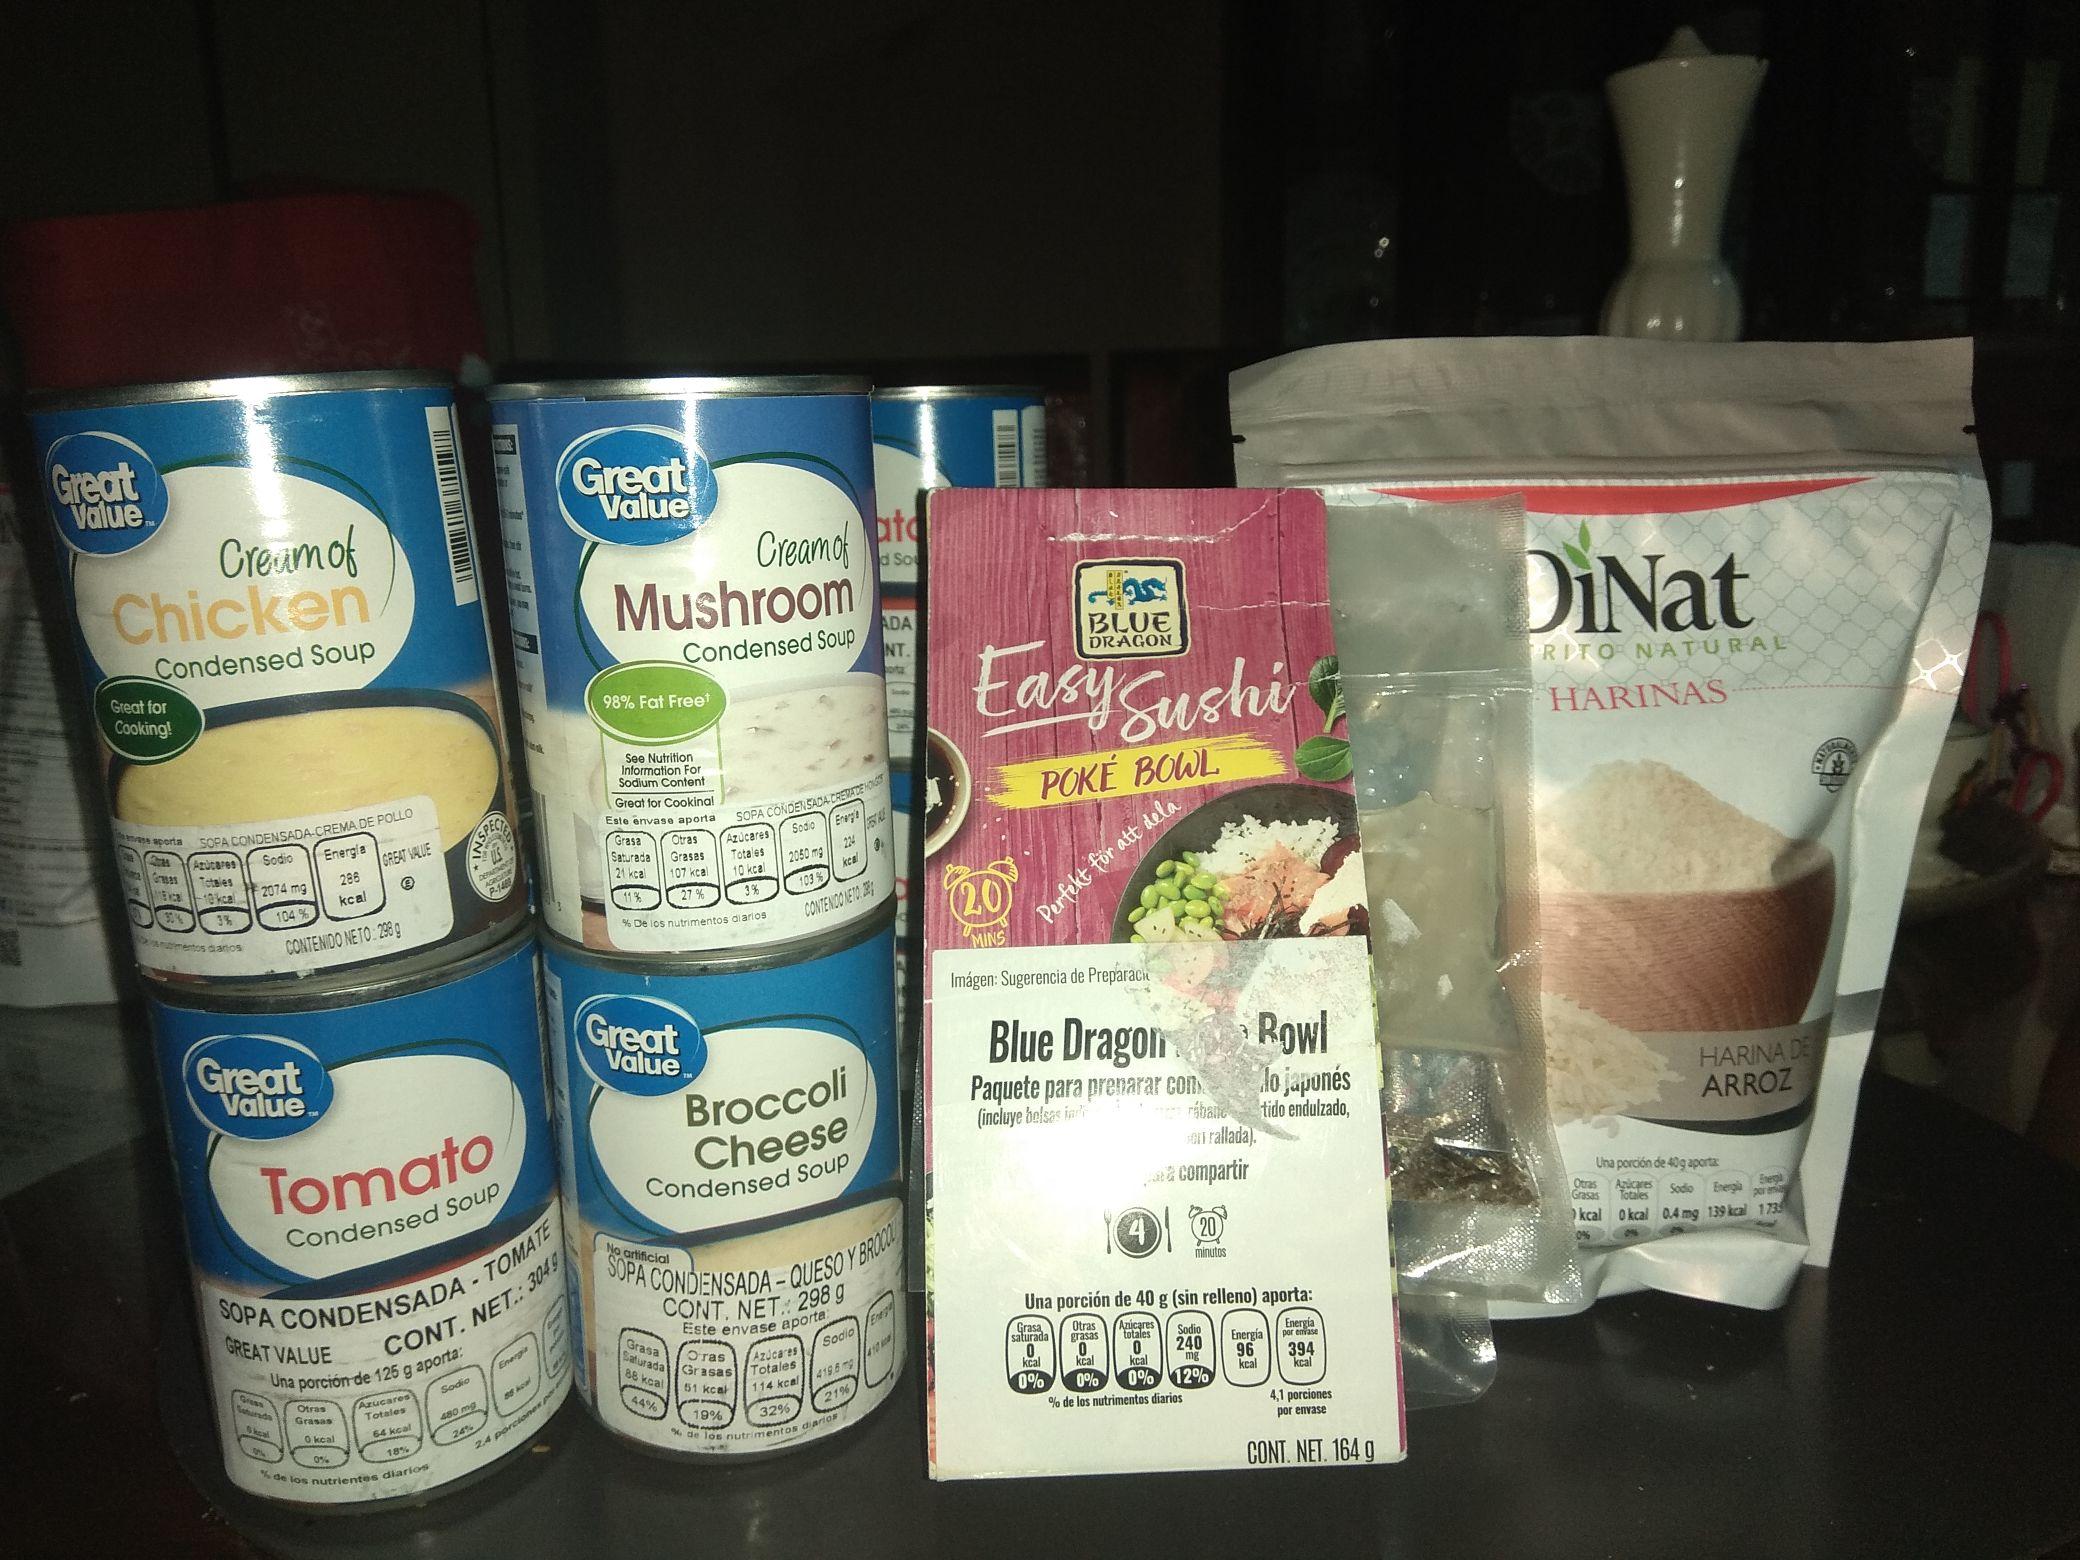 Walmart: Sopas condensadas varias Great Value, Harina de arroz DiNat, Blue Dragón Poké Bowl